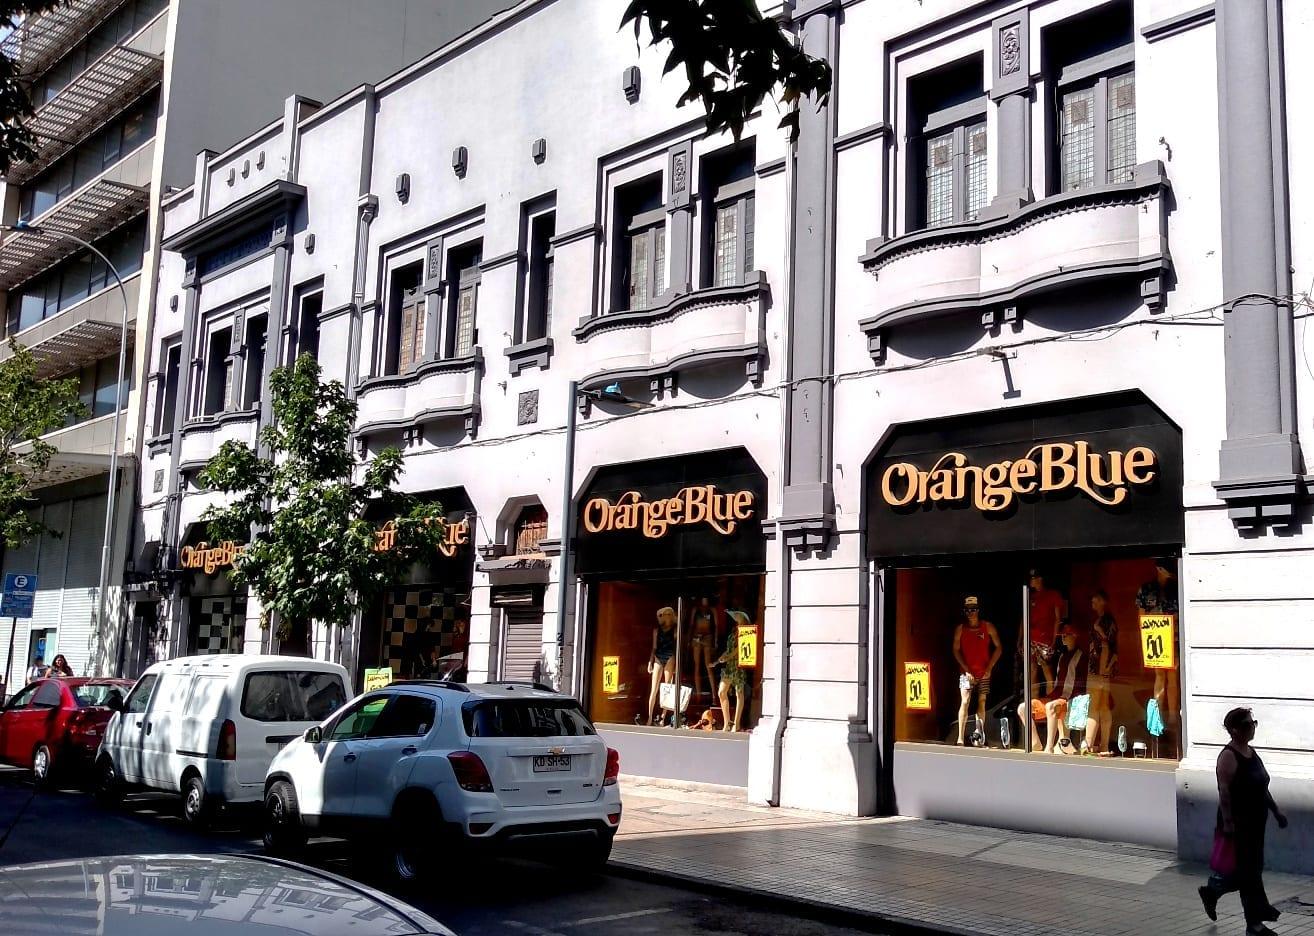 Orange Blue brecho em Santiago do Chile, onde comprar roupa barata, onde comprar roupa de neve, onde comprar roupa de frio, roupa de couro, LikeChile